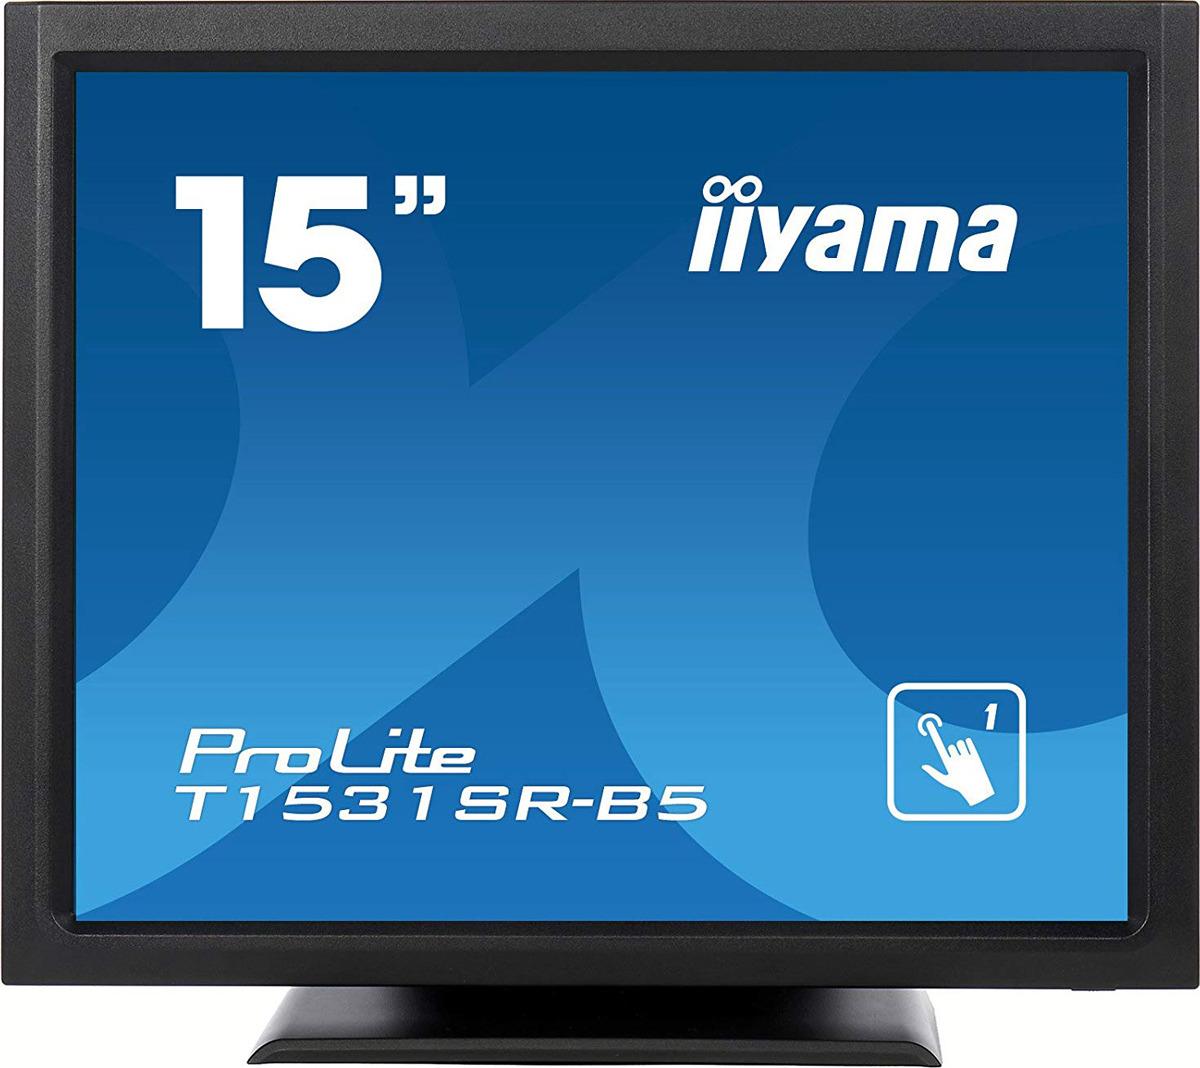 Монитор Iiyama 15 T1531SR-B5, черный монитор iiyama t1931saw b5